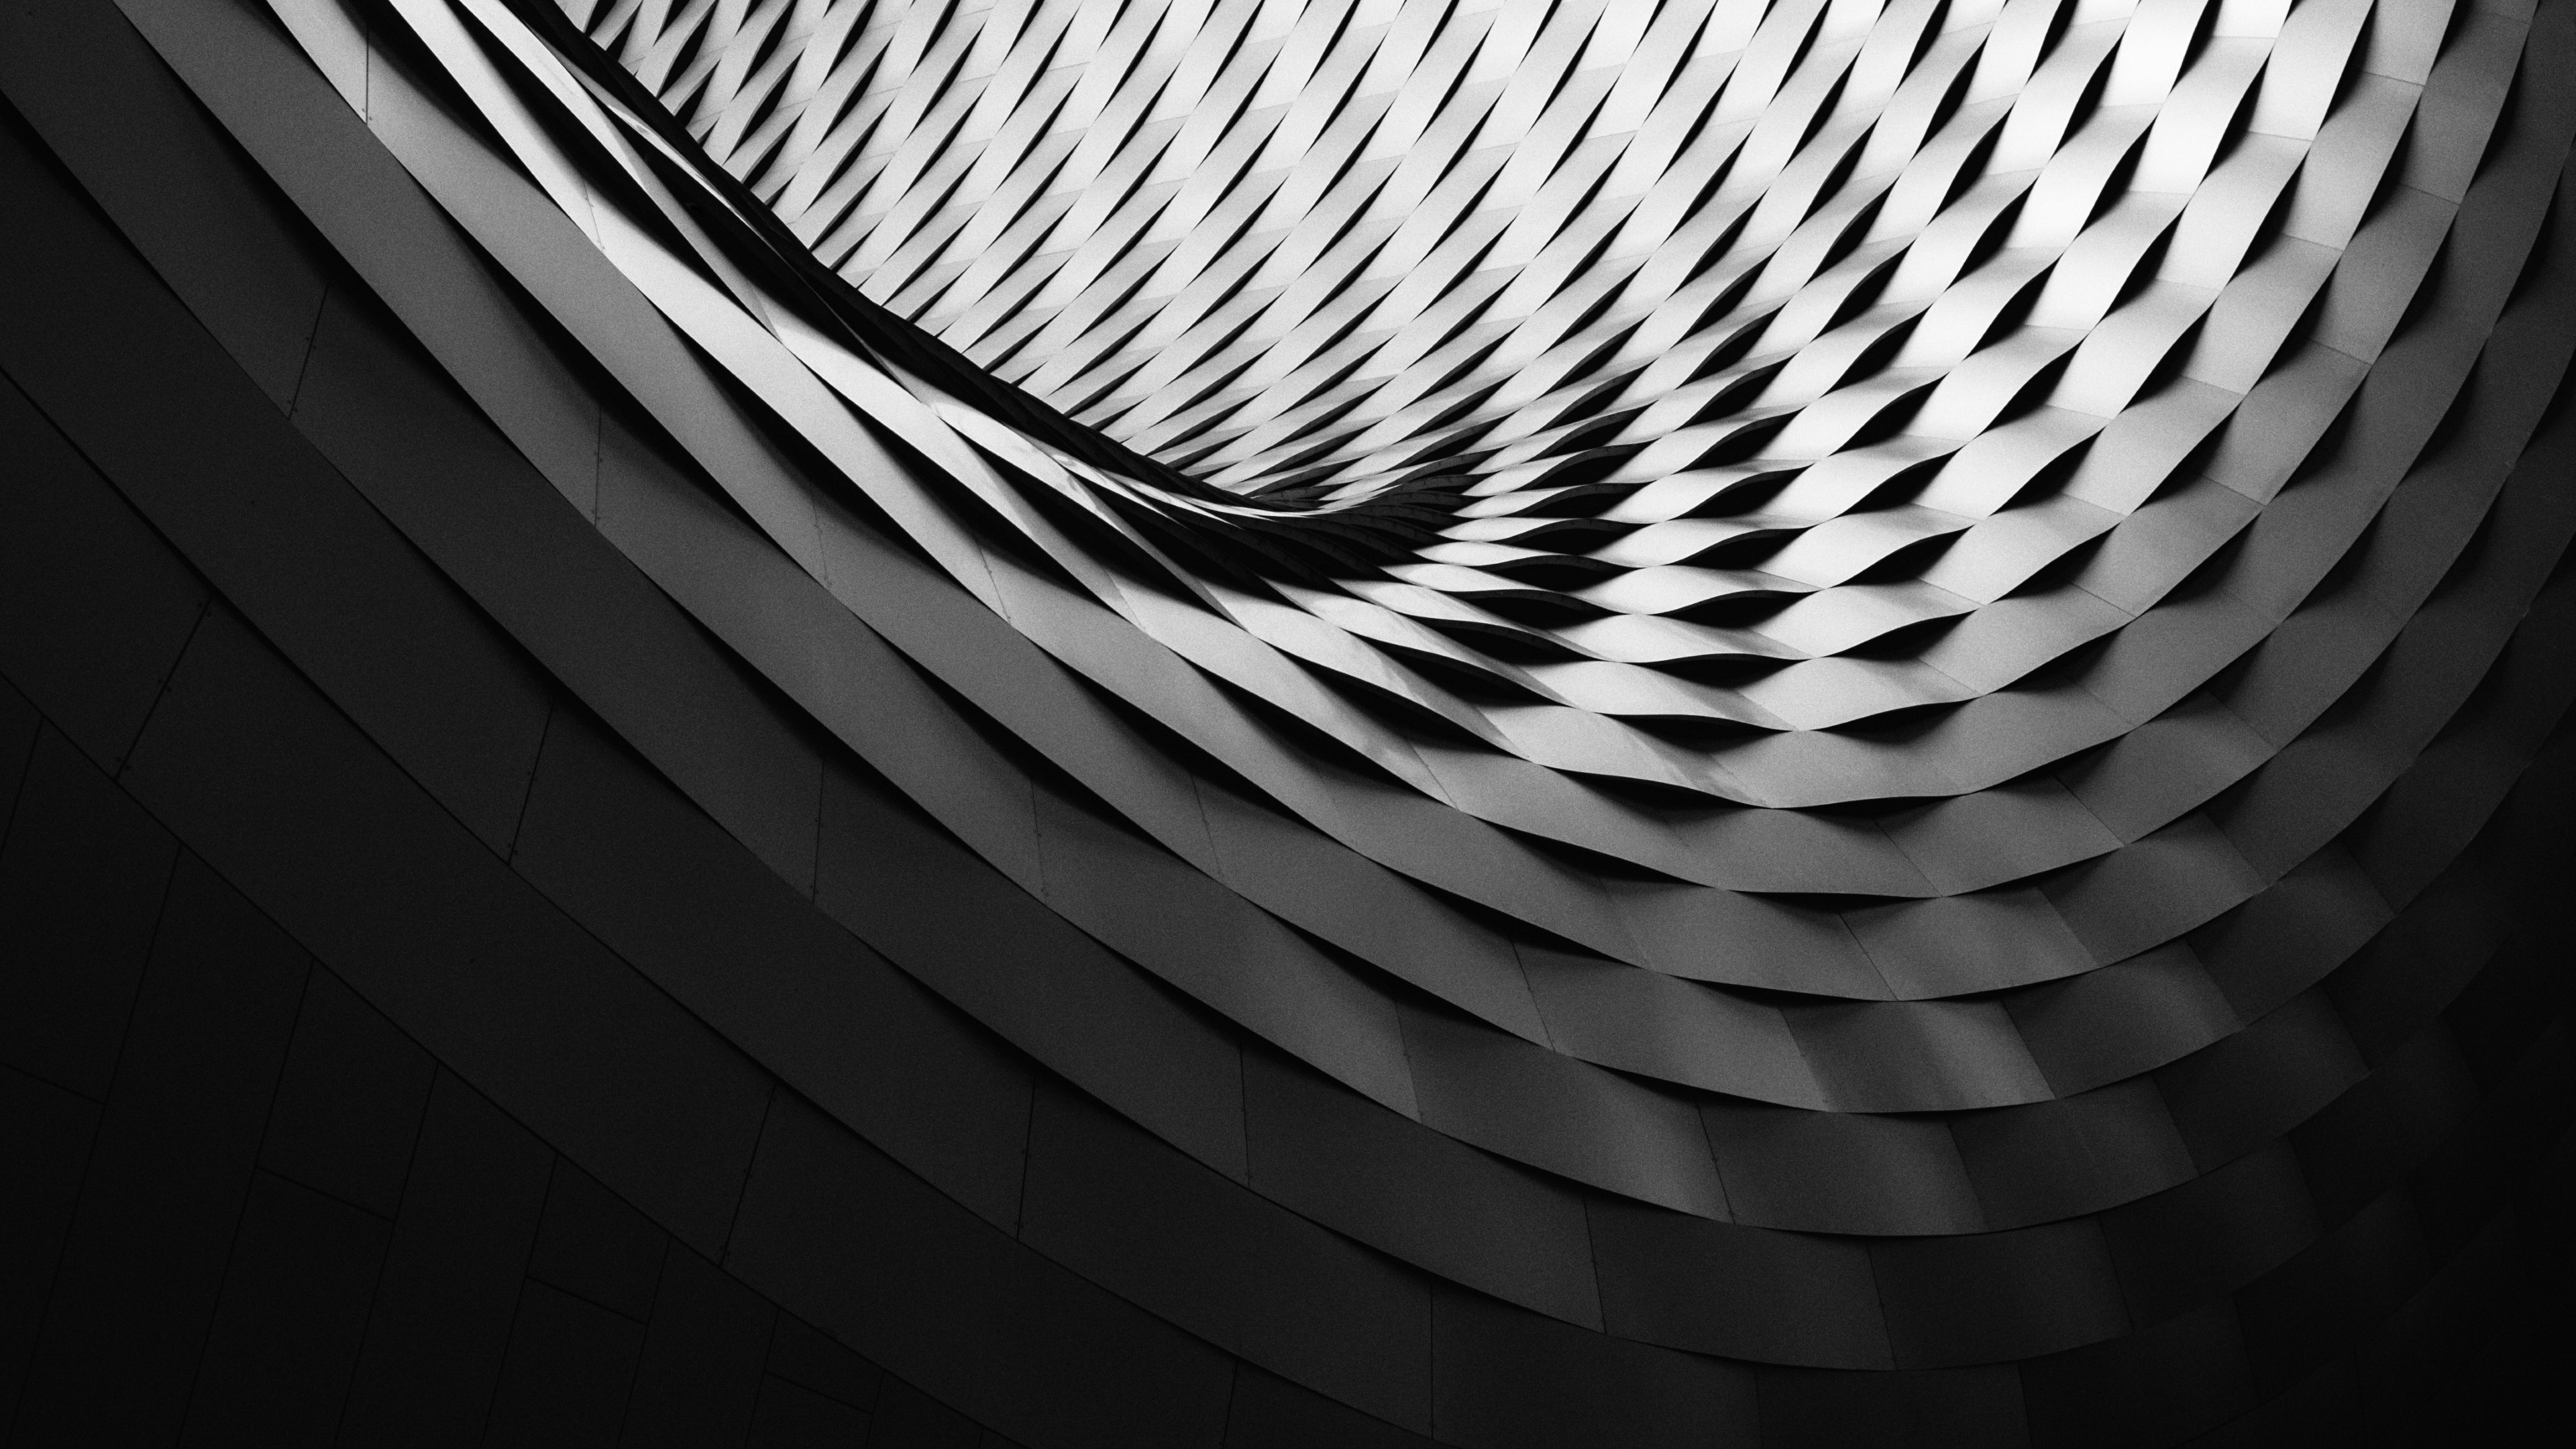 Scales by samuel zeller for Architecture papier